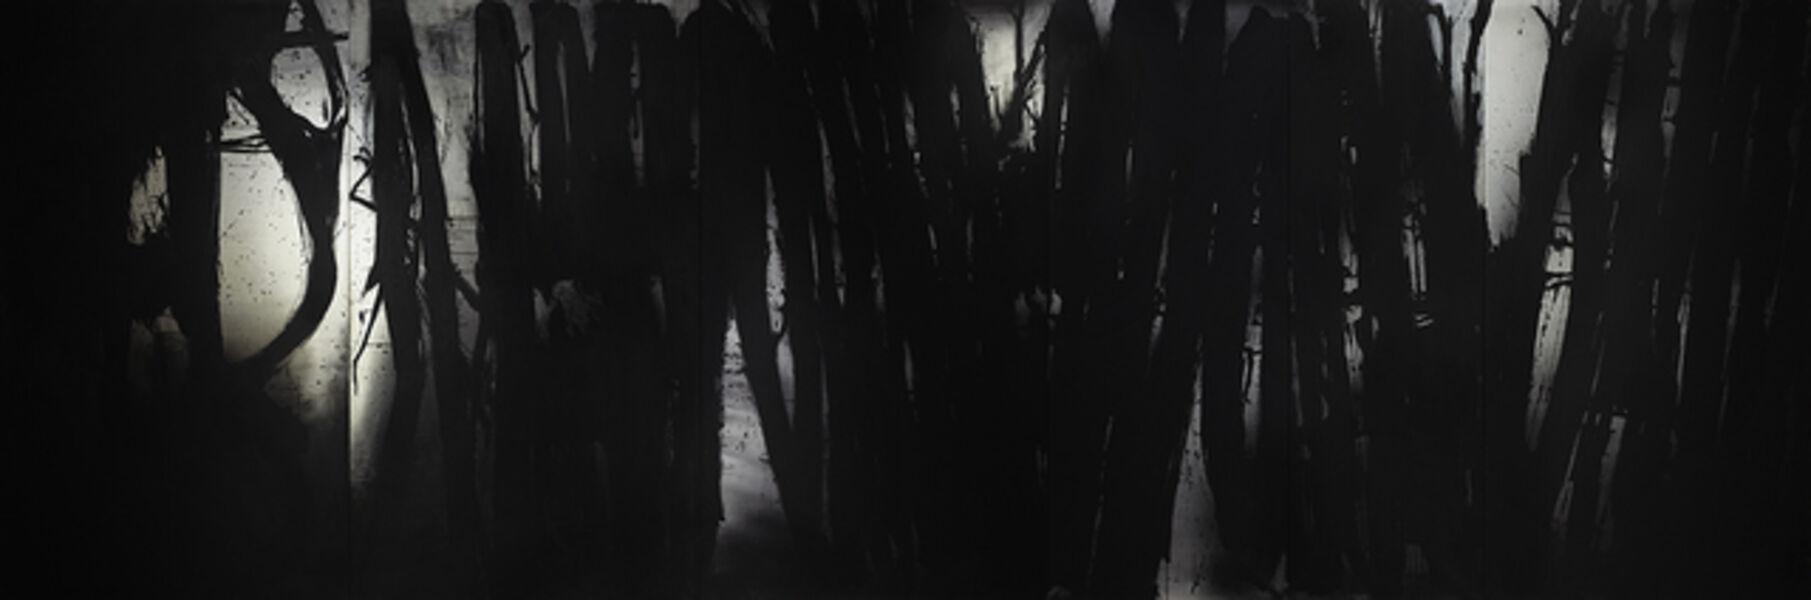 Anne Tompuri, 'Endless Forest II', 2018